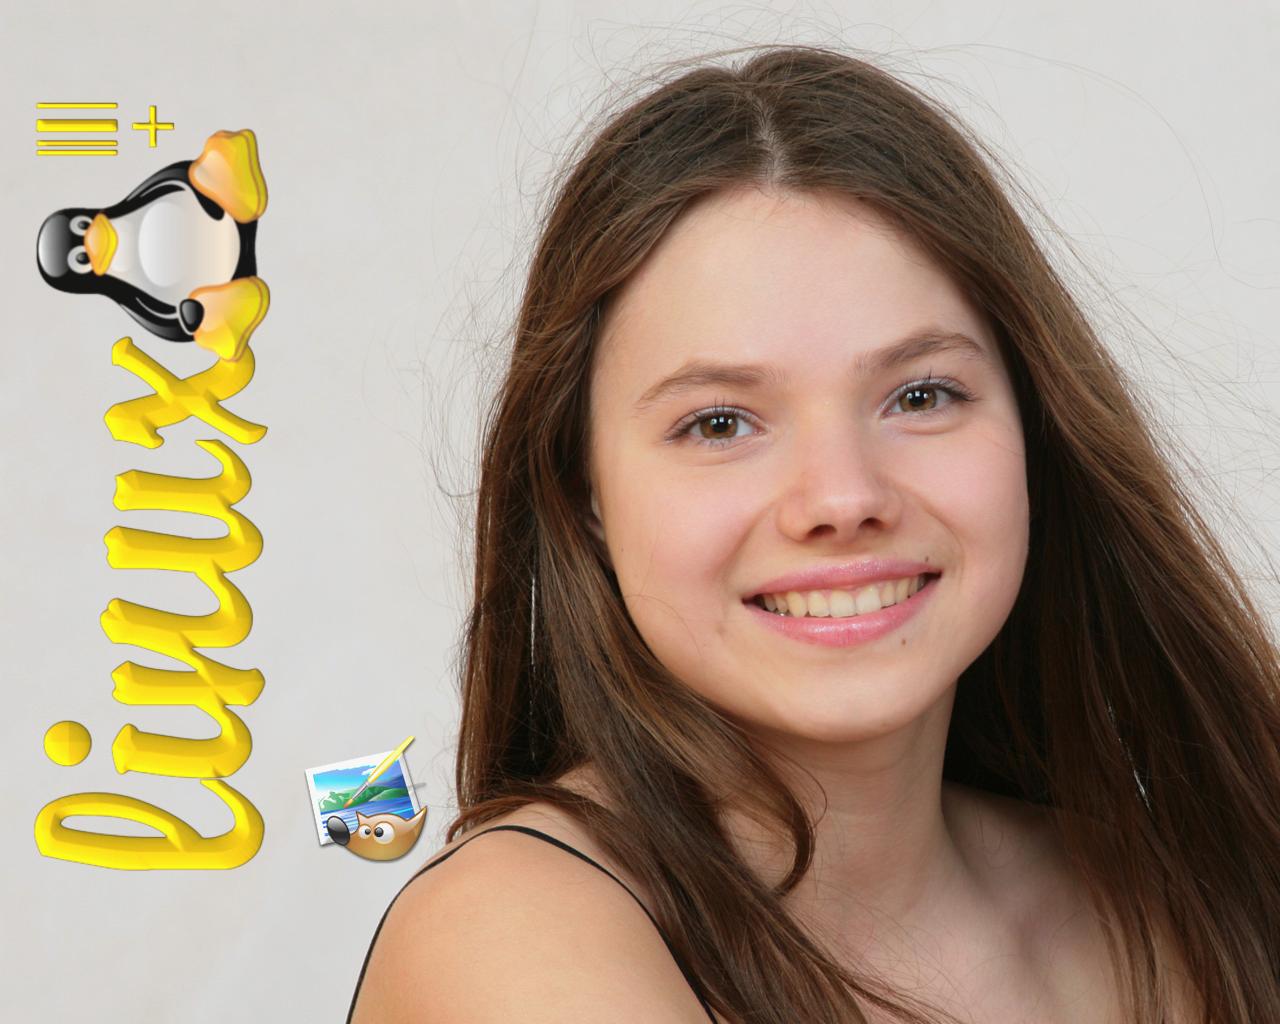 Young sandra orlow teen model